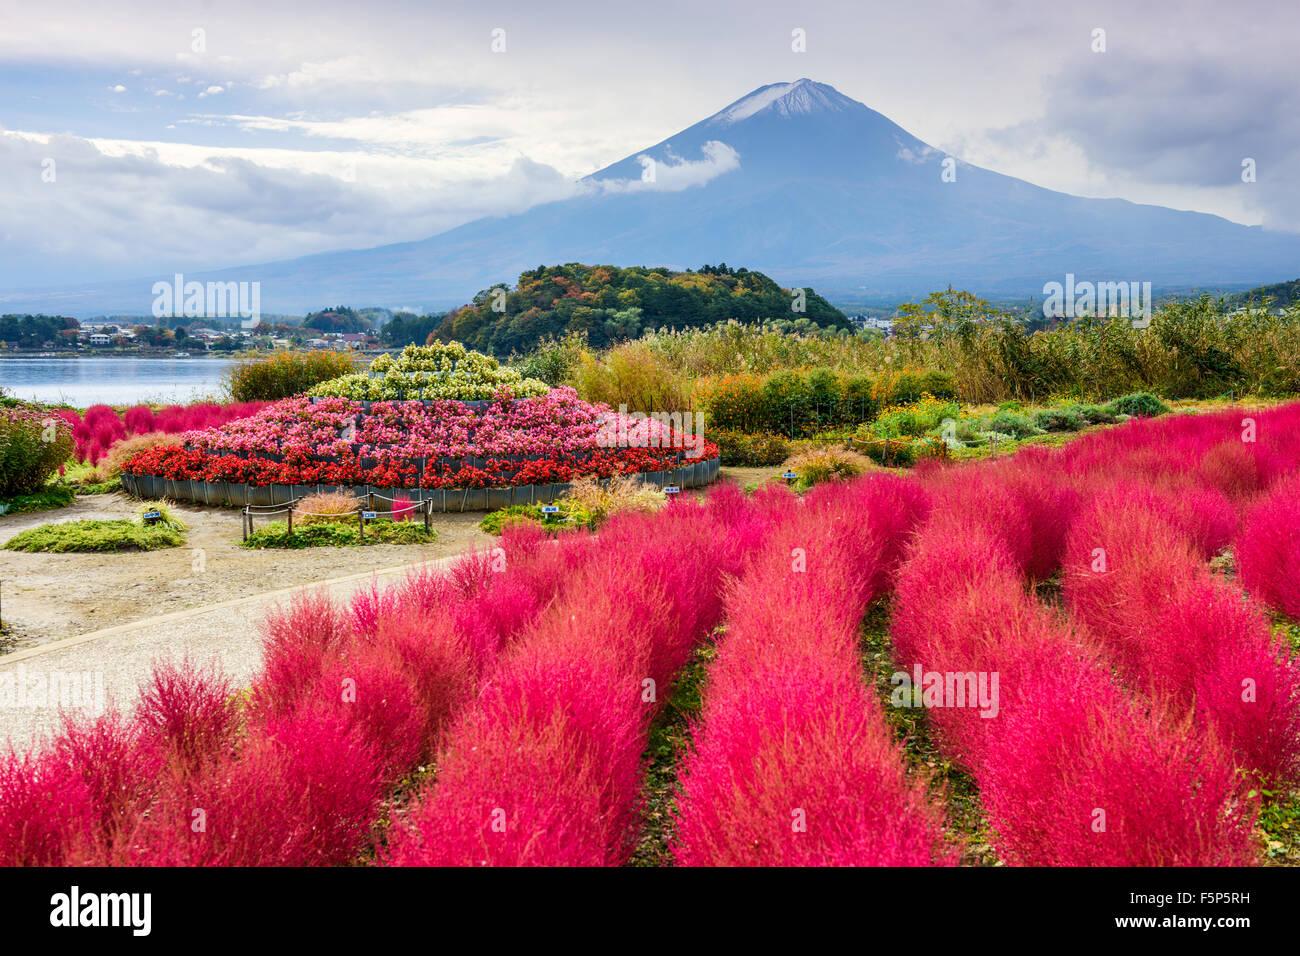 La montagne Fuji, au Japon avec kokia arbustes au parc Oishi. Photo Stock